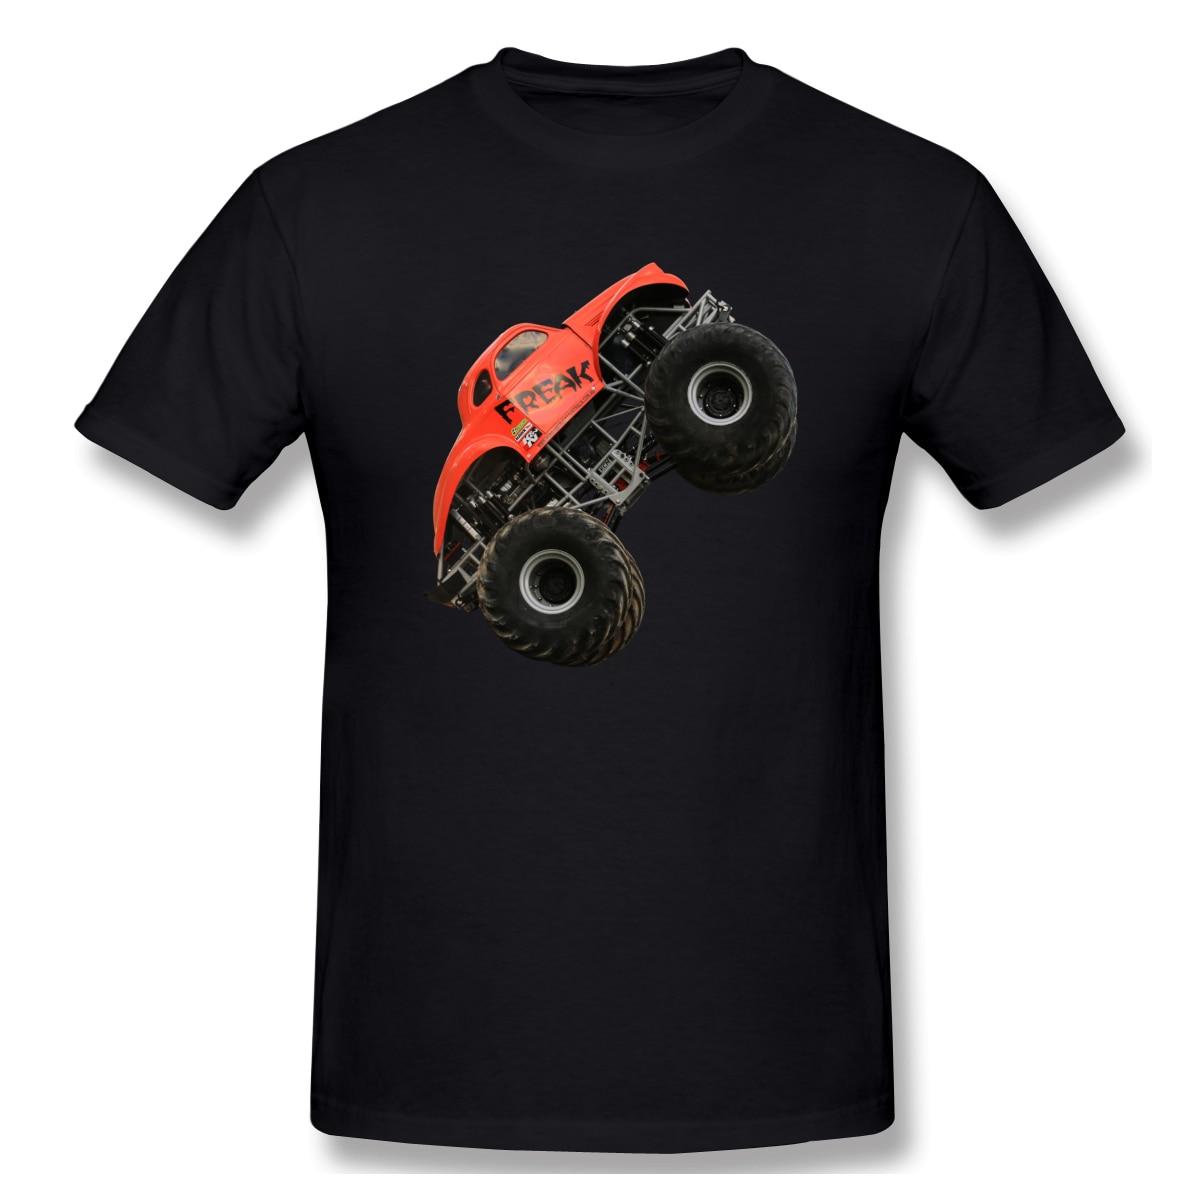 Verano 2020 hombres camiseta Monster Truck Jumping On The Race manga corta Camiseta Hombre o-cuello hombre Camiseta